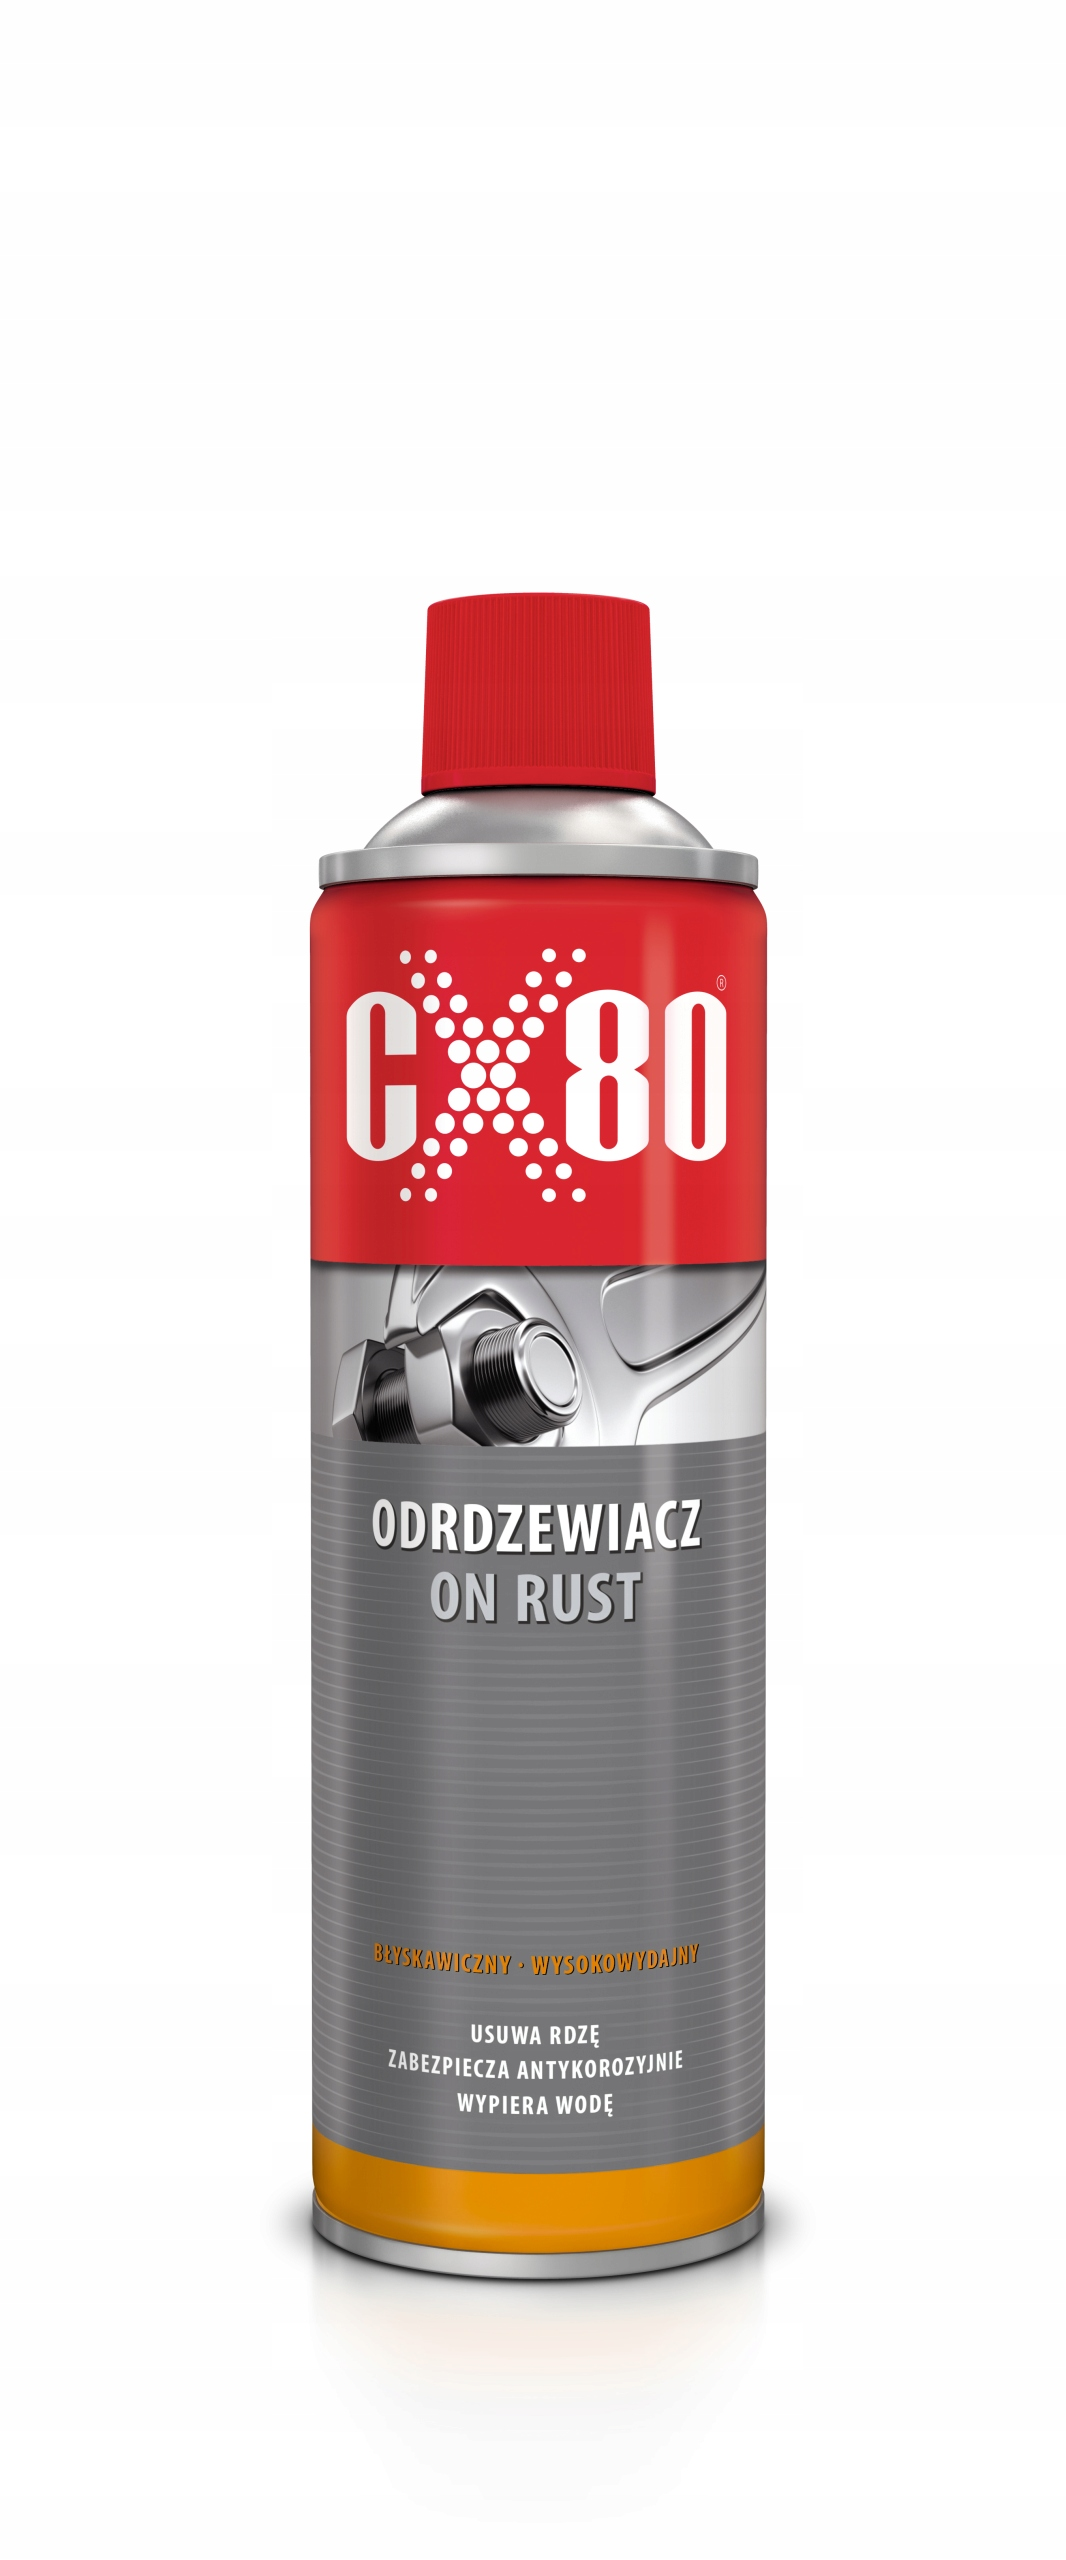 CX-80 средство для удаления ржавчины ON RUST 500 мл r476y